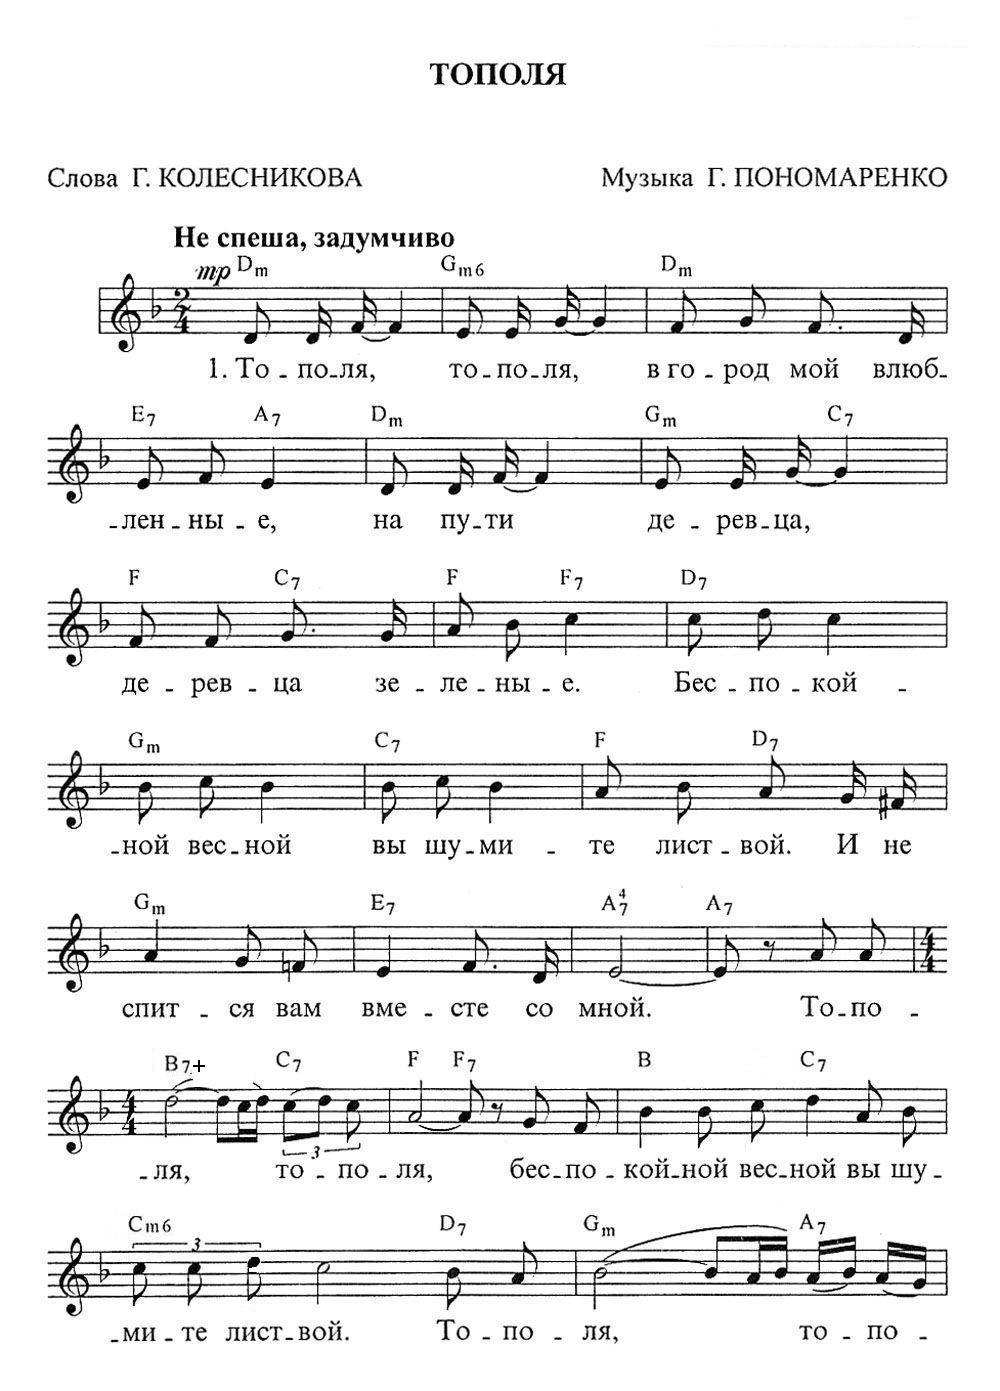 Григорий Пономаренко - Тополя. Ноты Аккорды 1